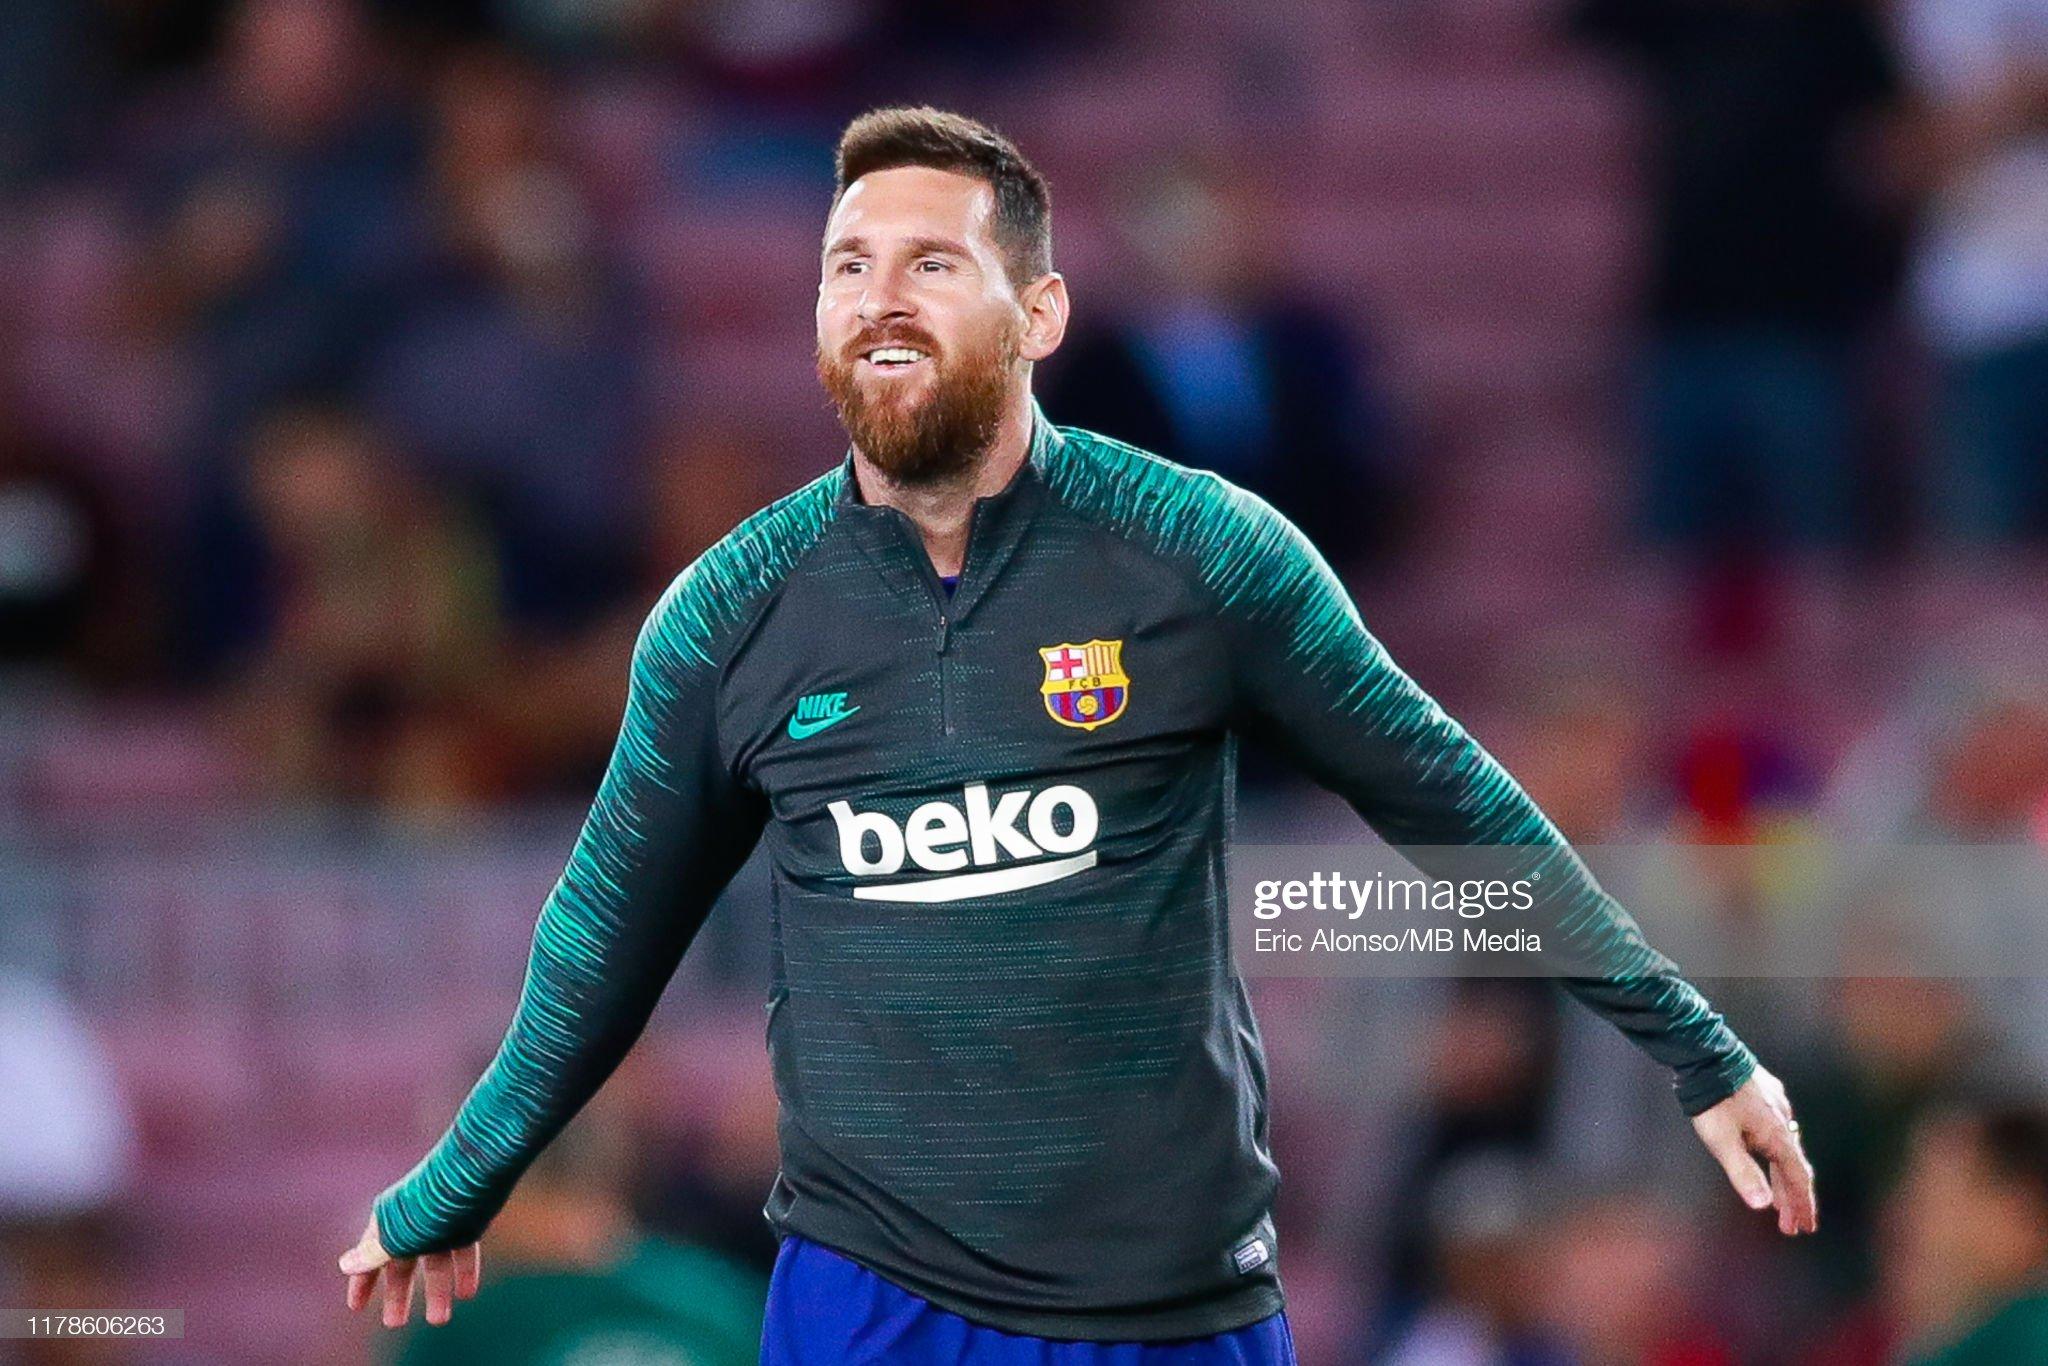 صور مباراة : برشلونة - إنتر 2-1 ( 02-10-2019 )  Lionel-messi-of-fc-barcelona-during-the-warm-up-of-the-uefa-champions-picture-id1178606263?s=2048x2048